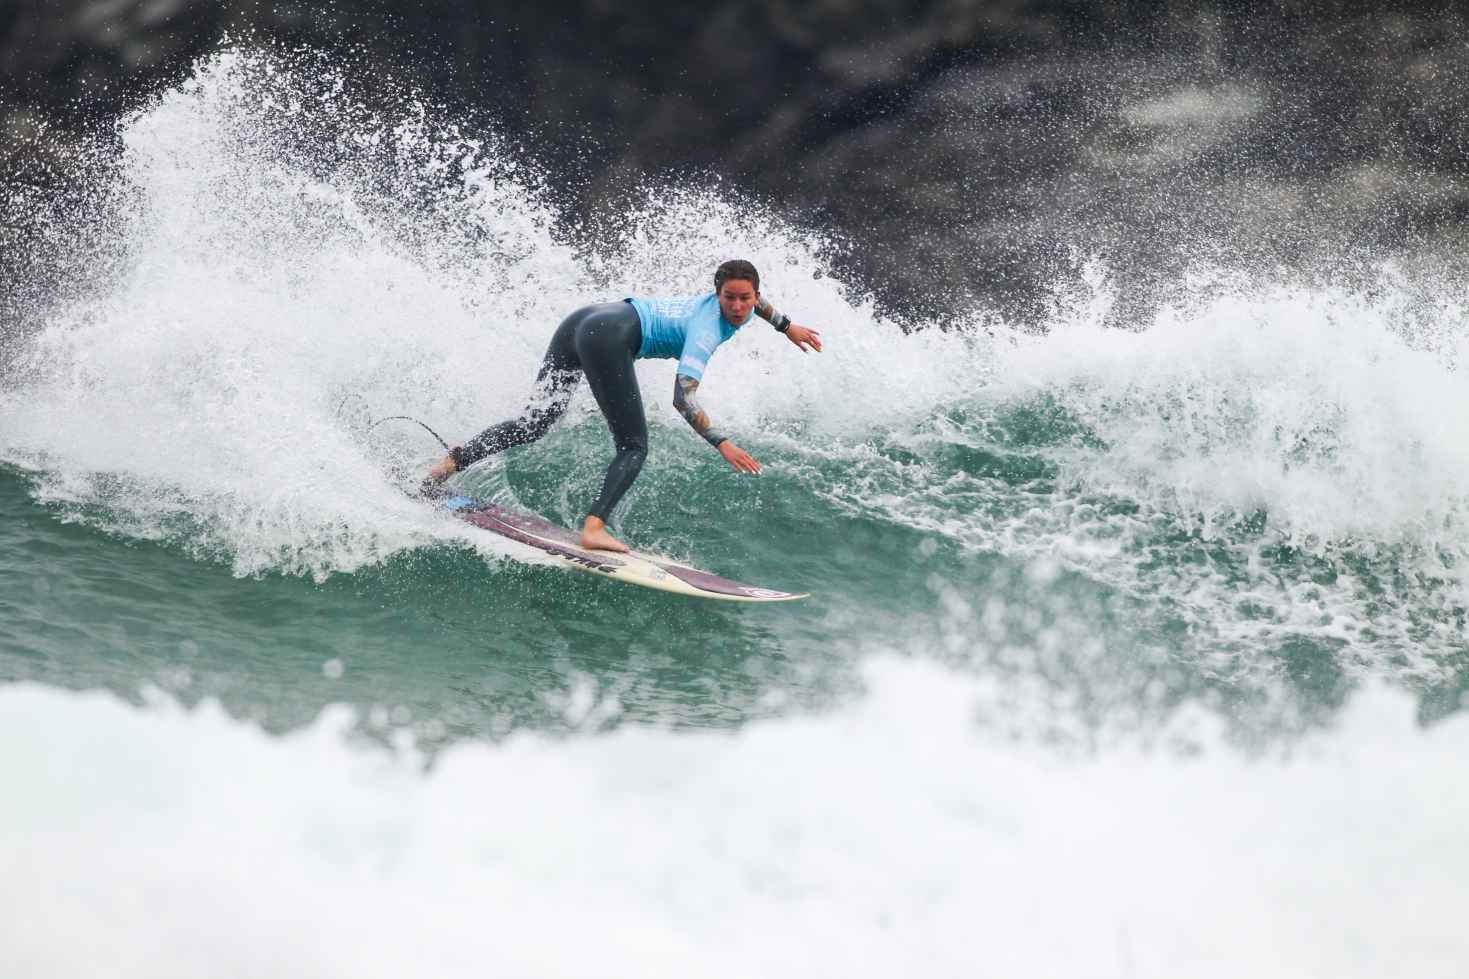 surf30 pantin classic 2021 wsl surf Melania Suarez Diaz 0017PantinClassic2021Masurel